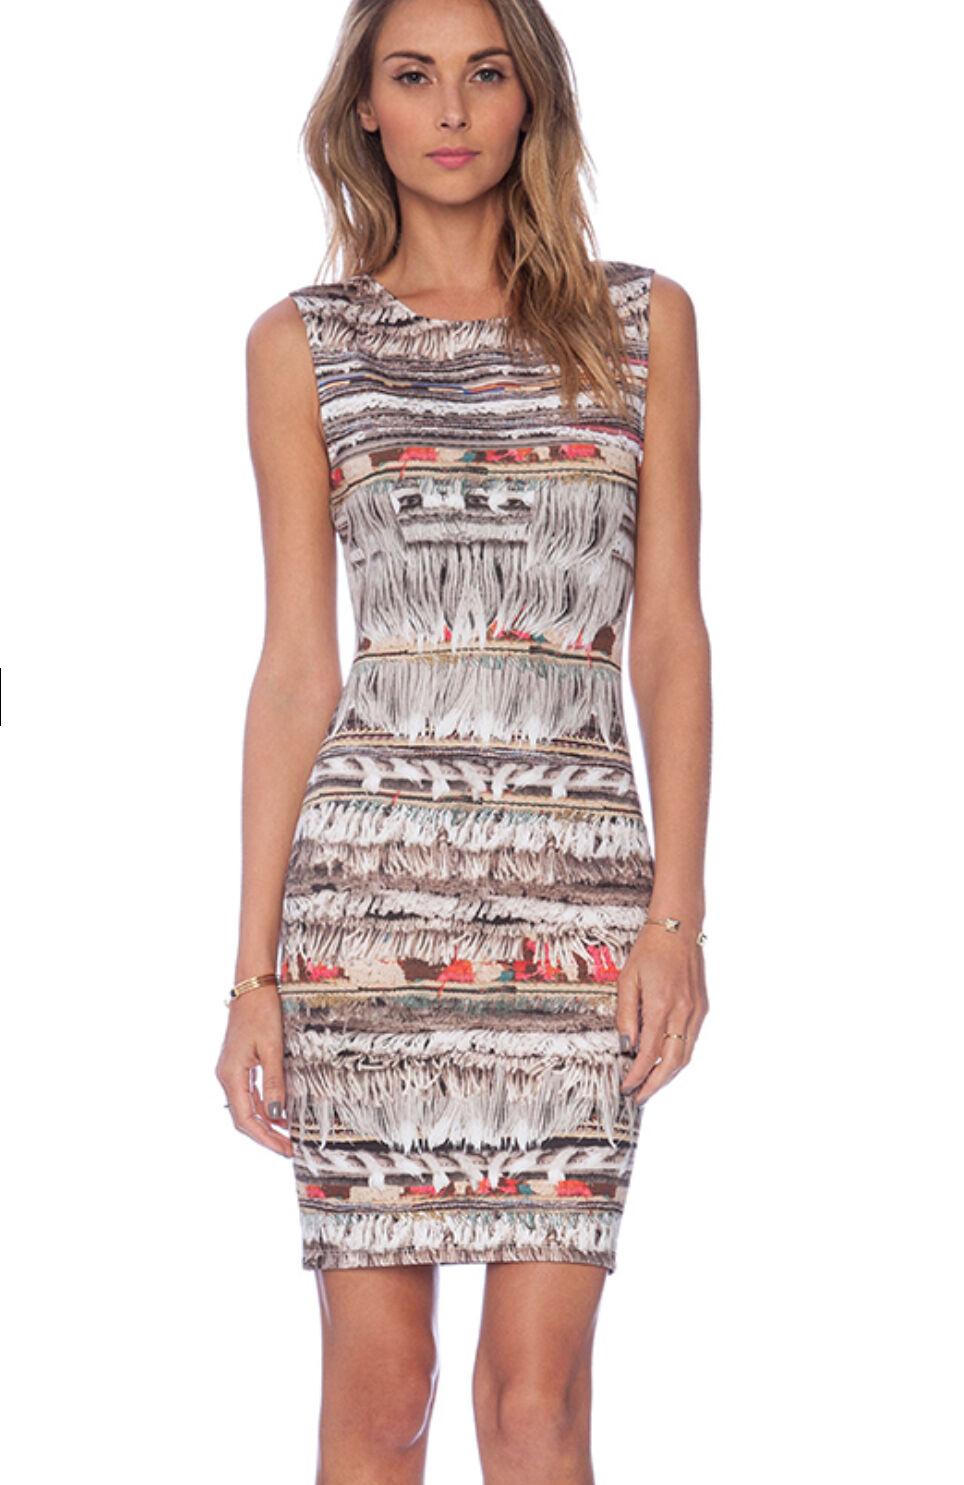 NWT Mara Hoffman neoprene fringe sleeveless dress choose Größe S  -